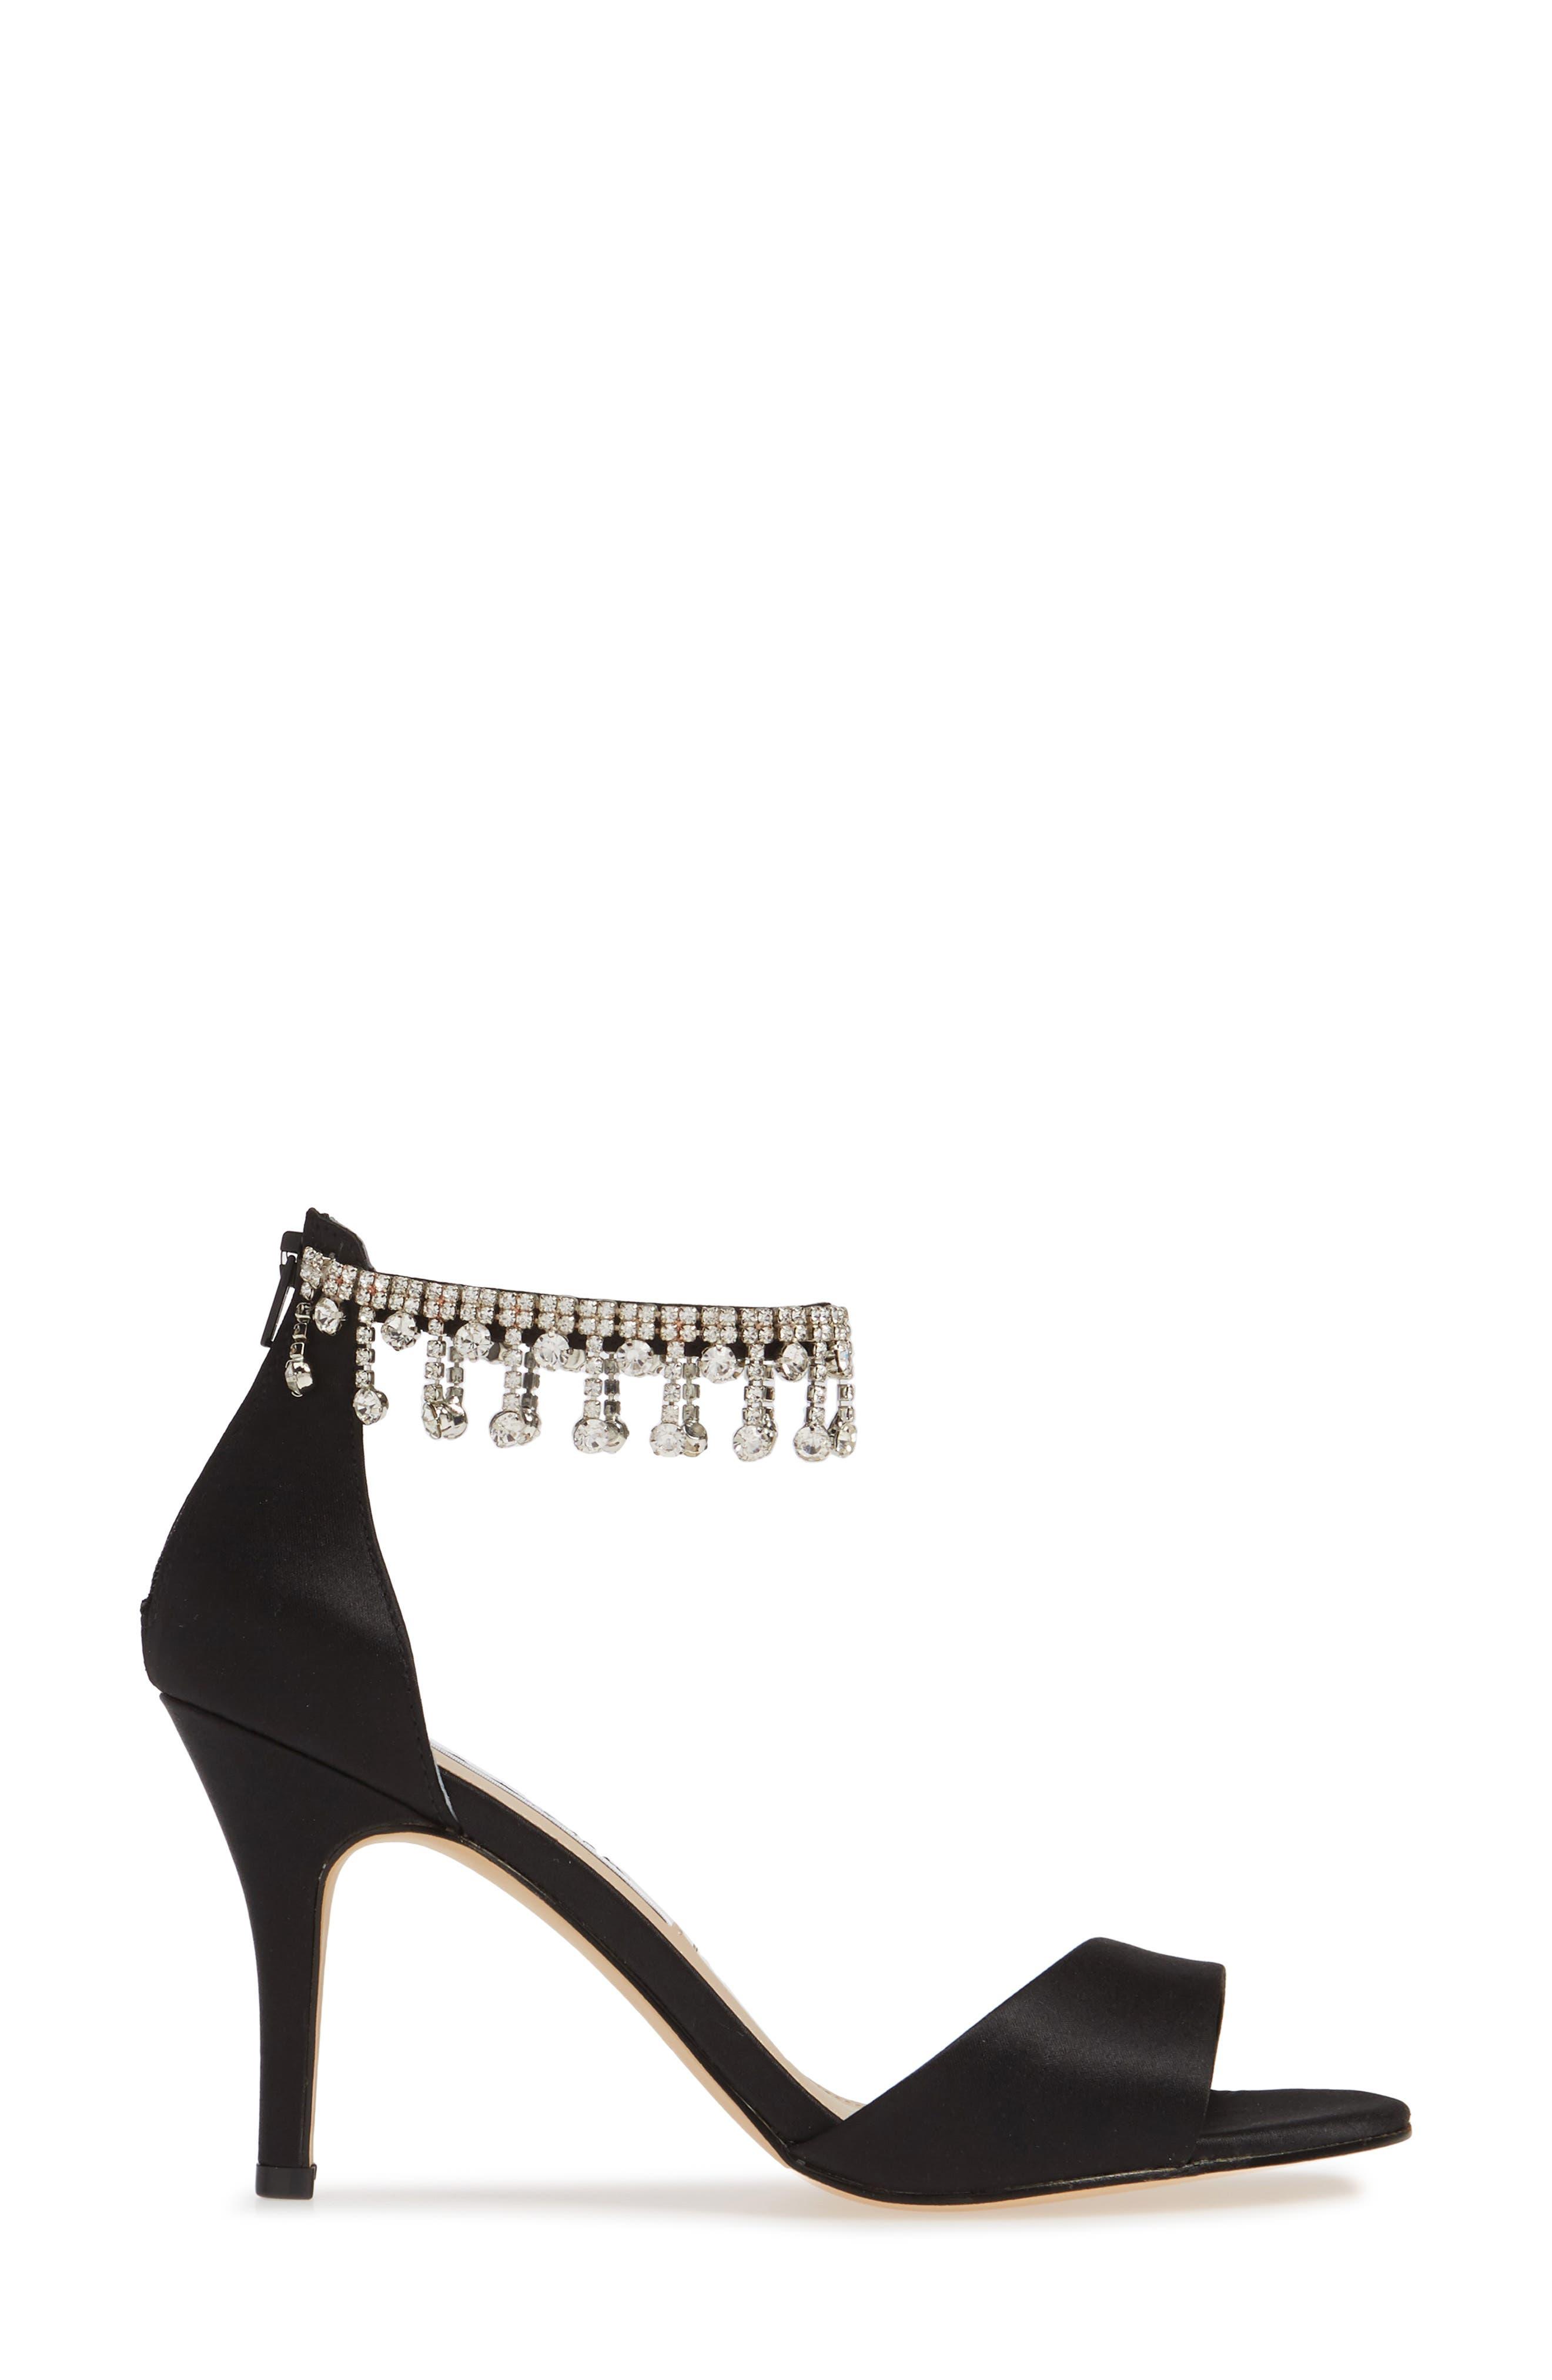 NINA, Vera Embellished Ankle Strap Sandal, Alternate thumbnail 3, color, BLACK SATIN